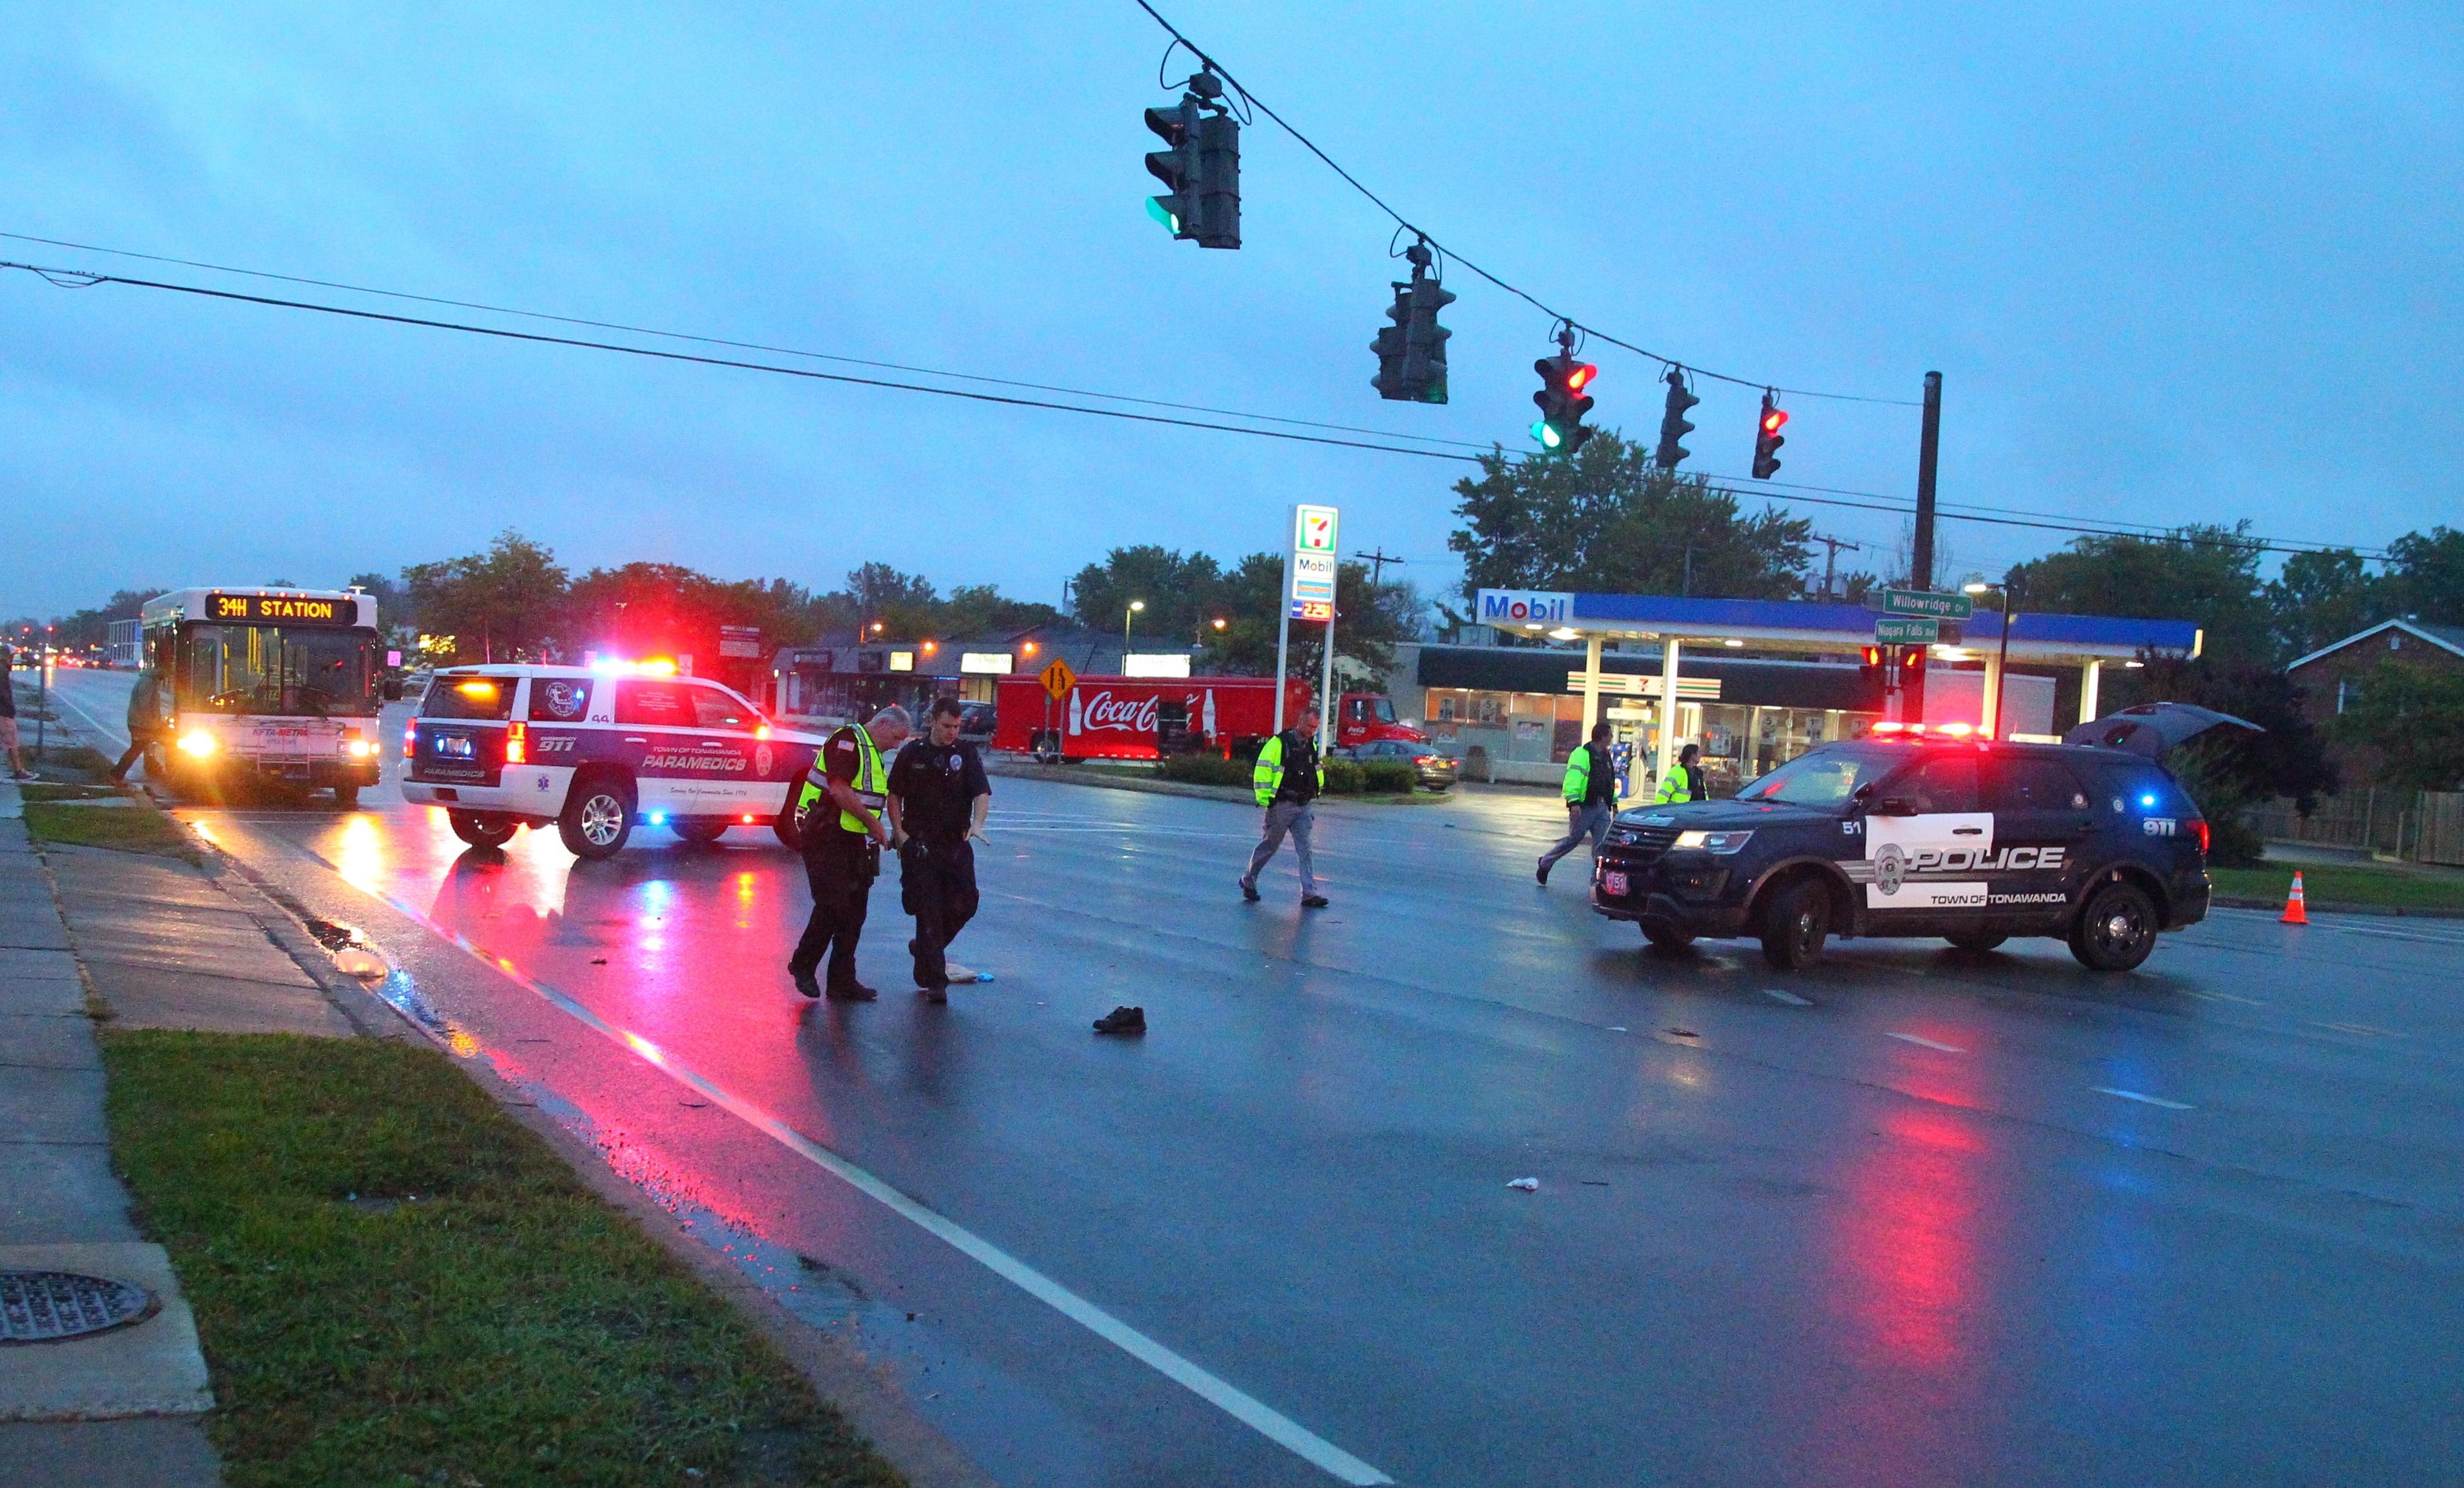 Tonawanda Police on the scene where a pedestrian was hit by a vehicle on Niagara Falls Boulevard at Willow Ridge in the Town of Tonawanda on Thursday, Sept. 29, 2016. (John Hickey/Buffalo News)